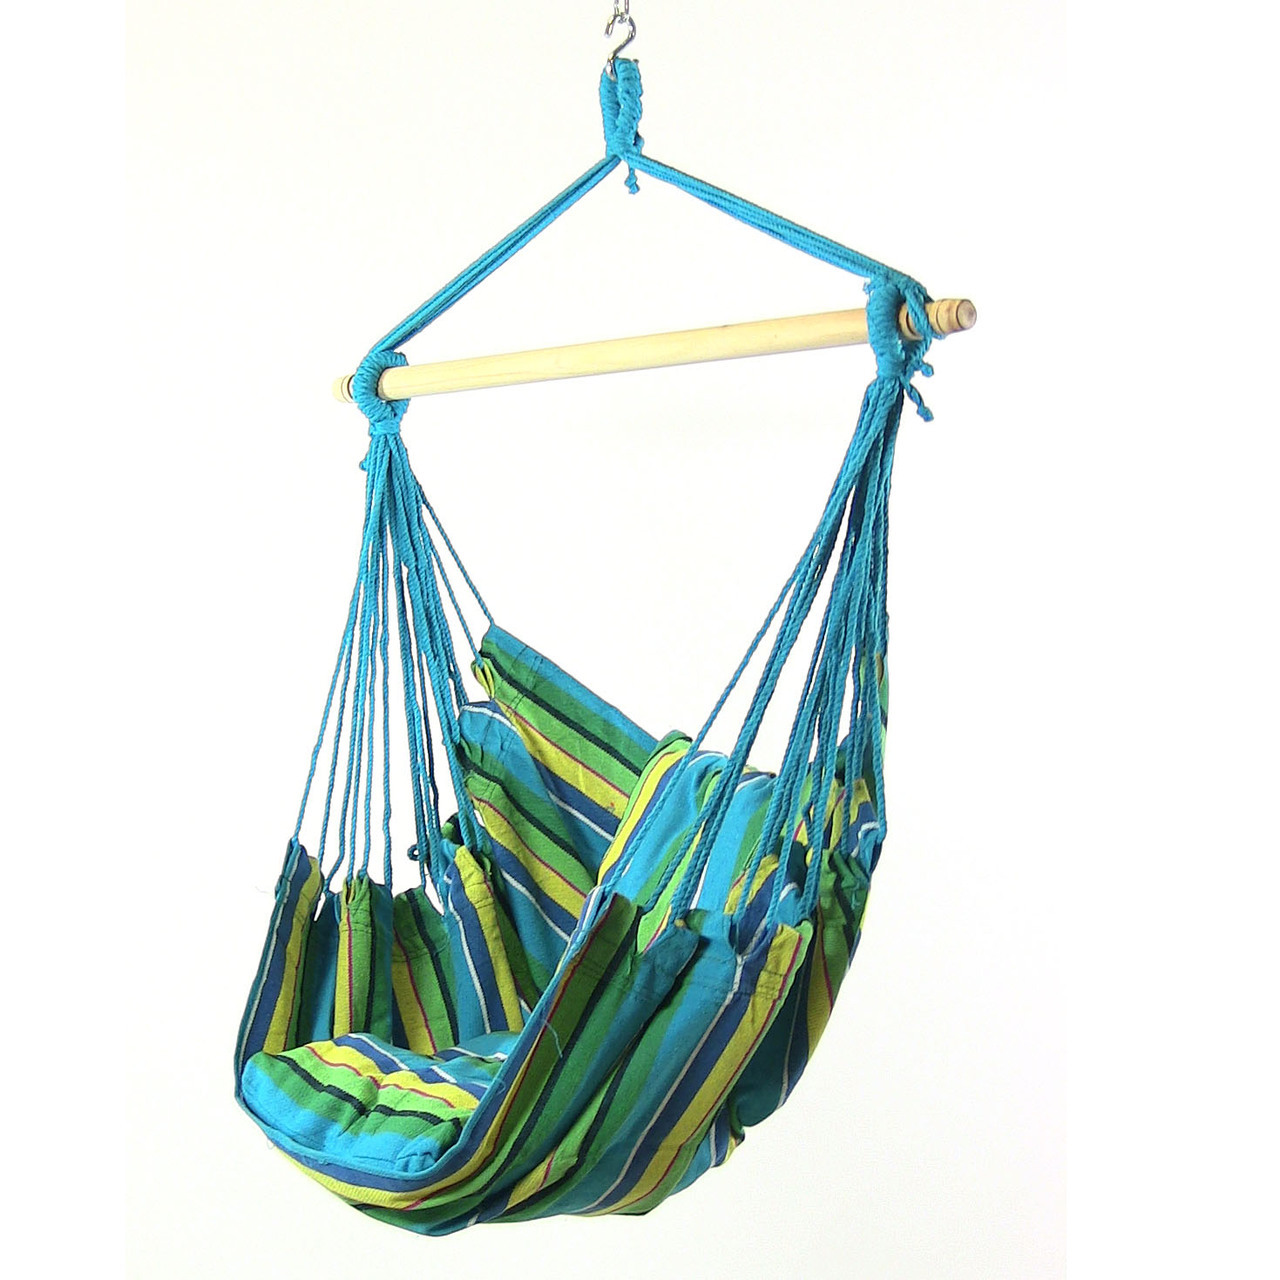 Sunnydaze Hanging Hammock Swing for Indoor Outdoor (Set of 2), Sunset Oasis by Sunnydaze Decor